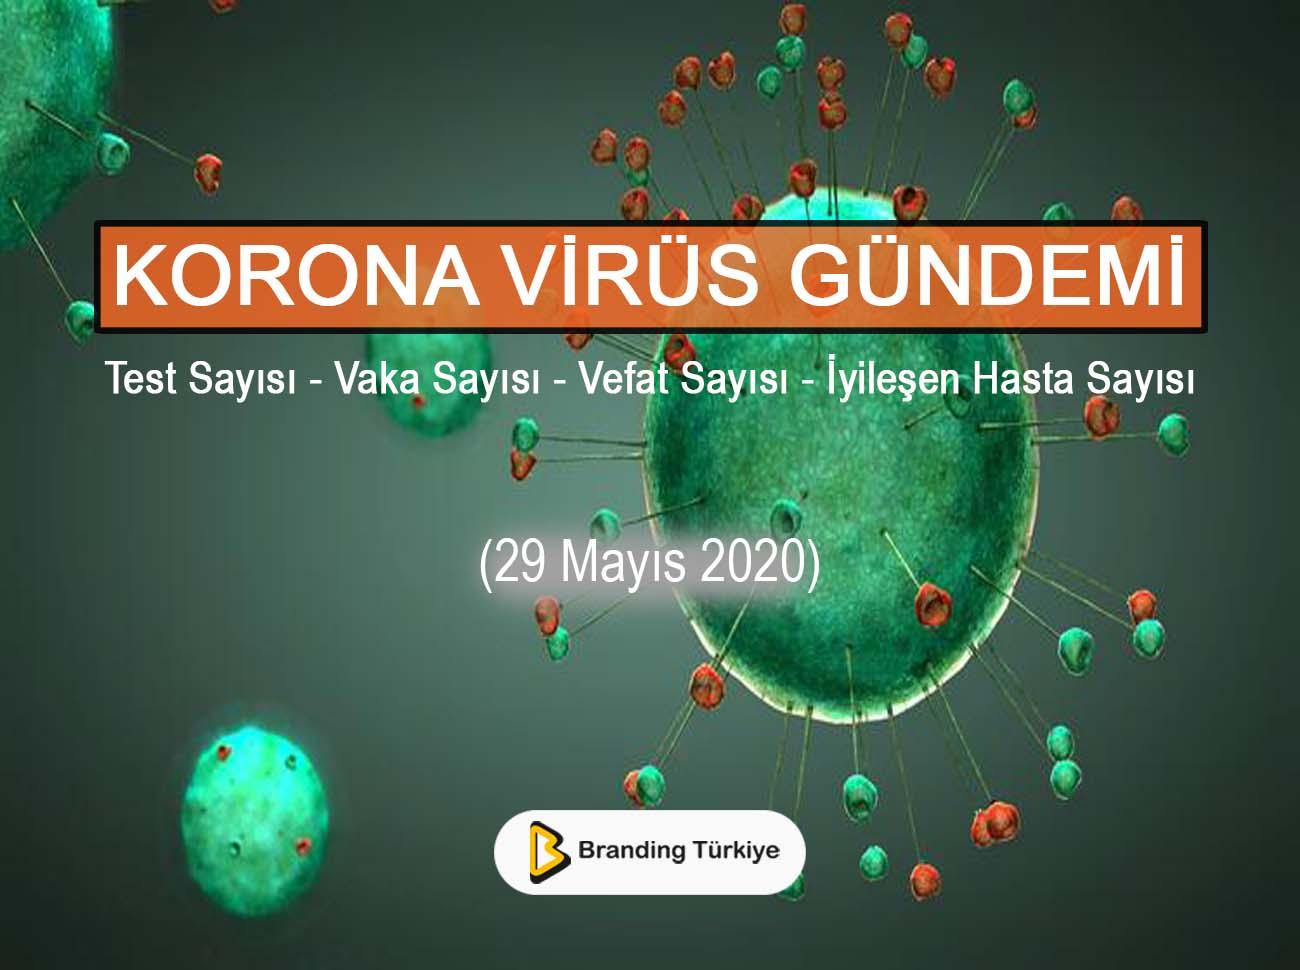 Korona Virüs Gündemi (29 Mayıs 2020)